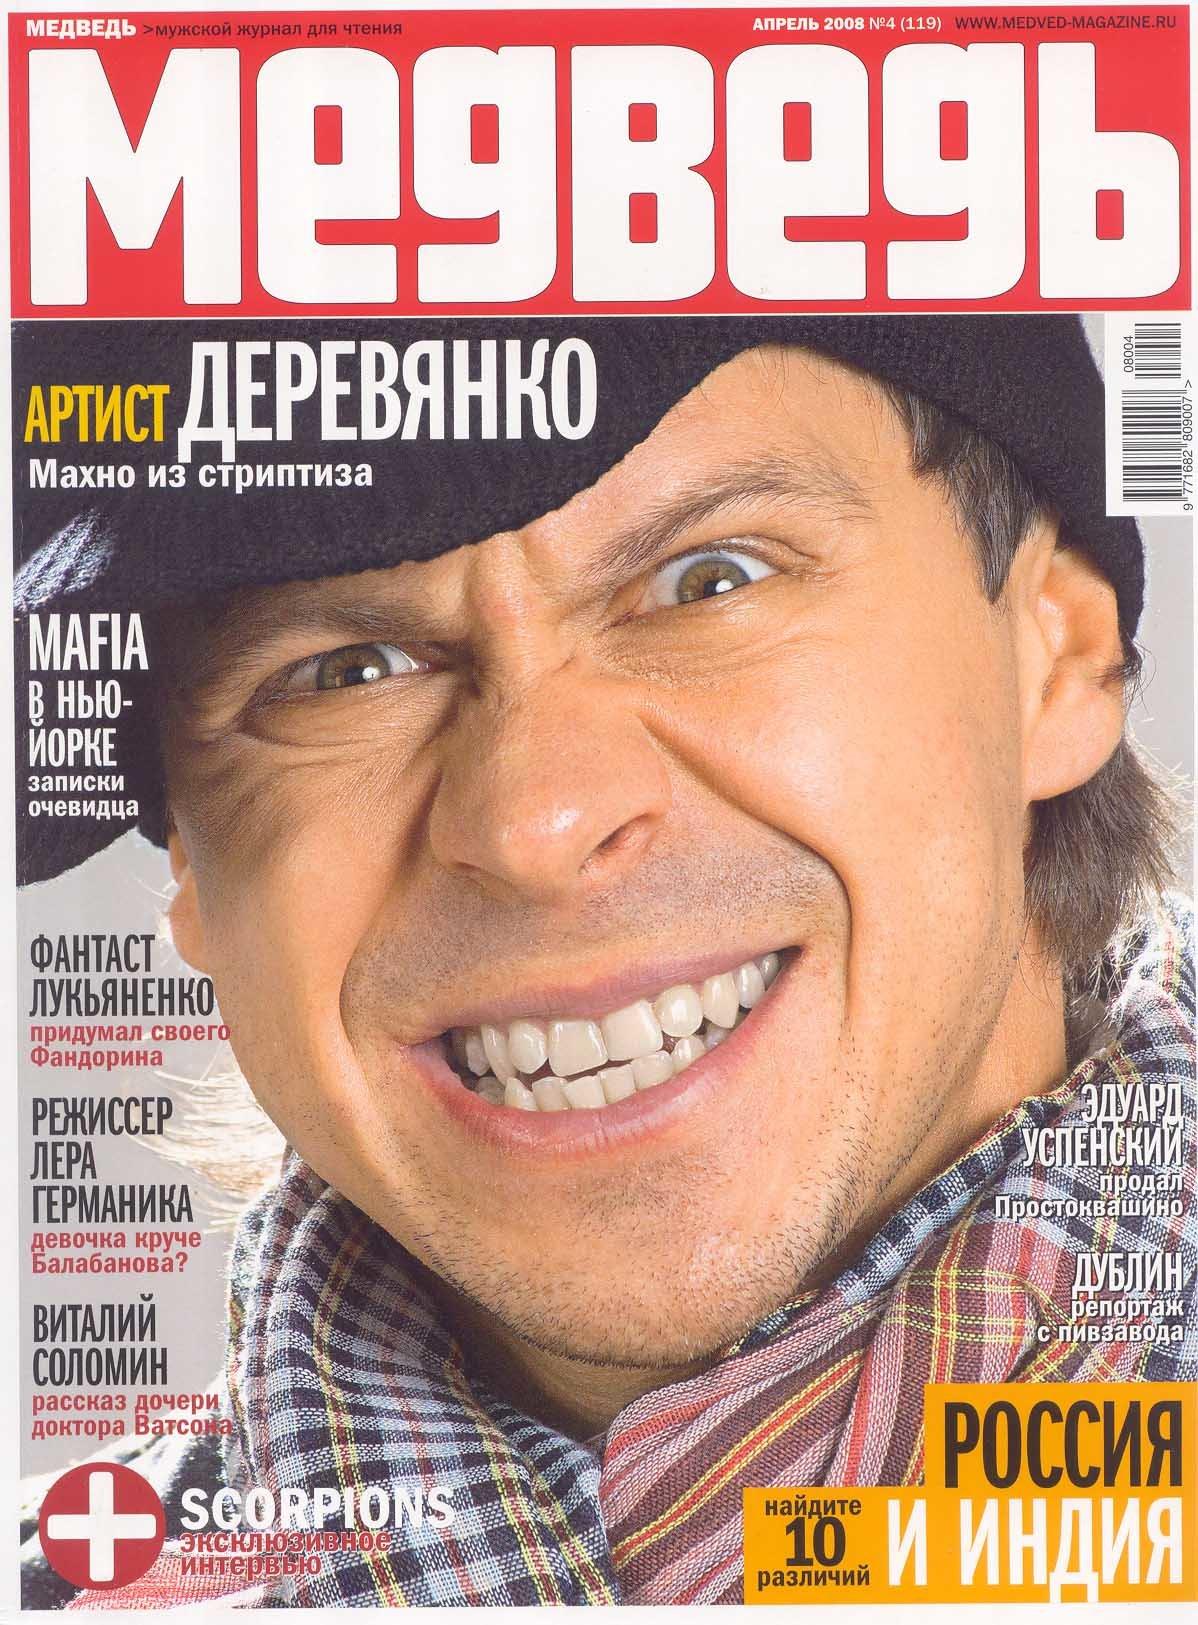 Журналы для мужчин смотреть фото родилась мечта